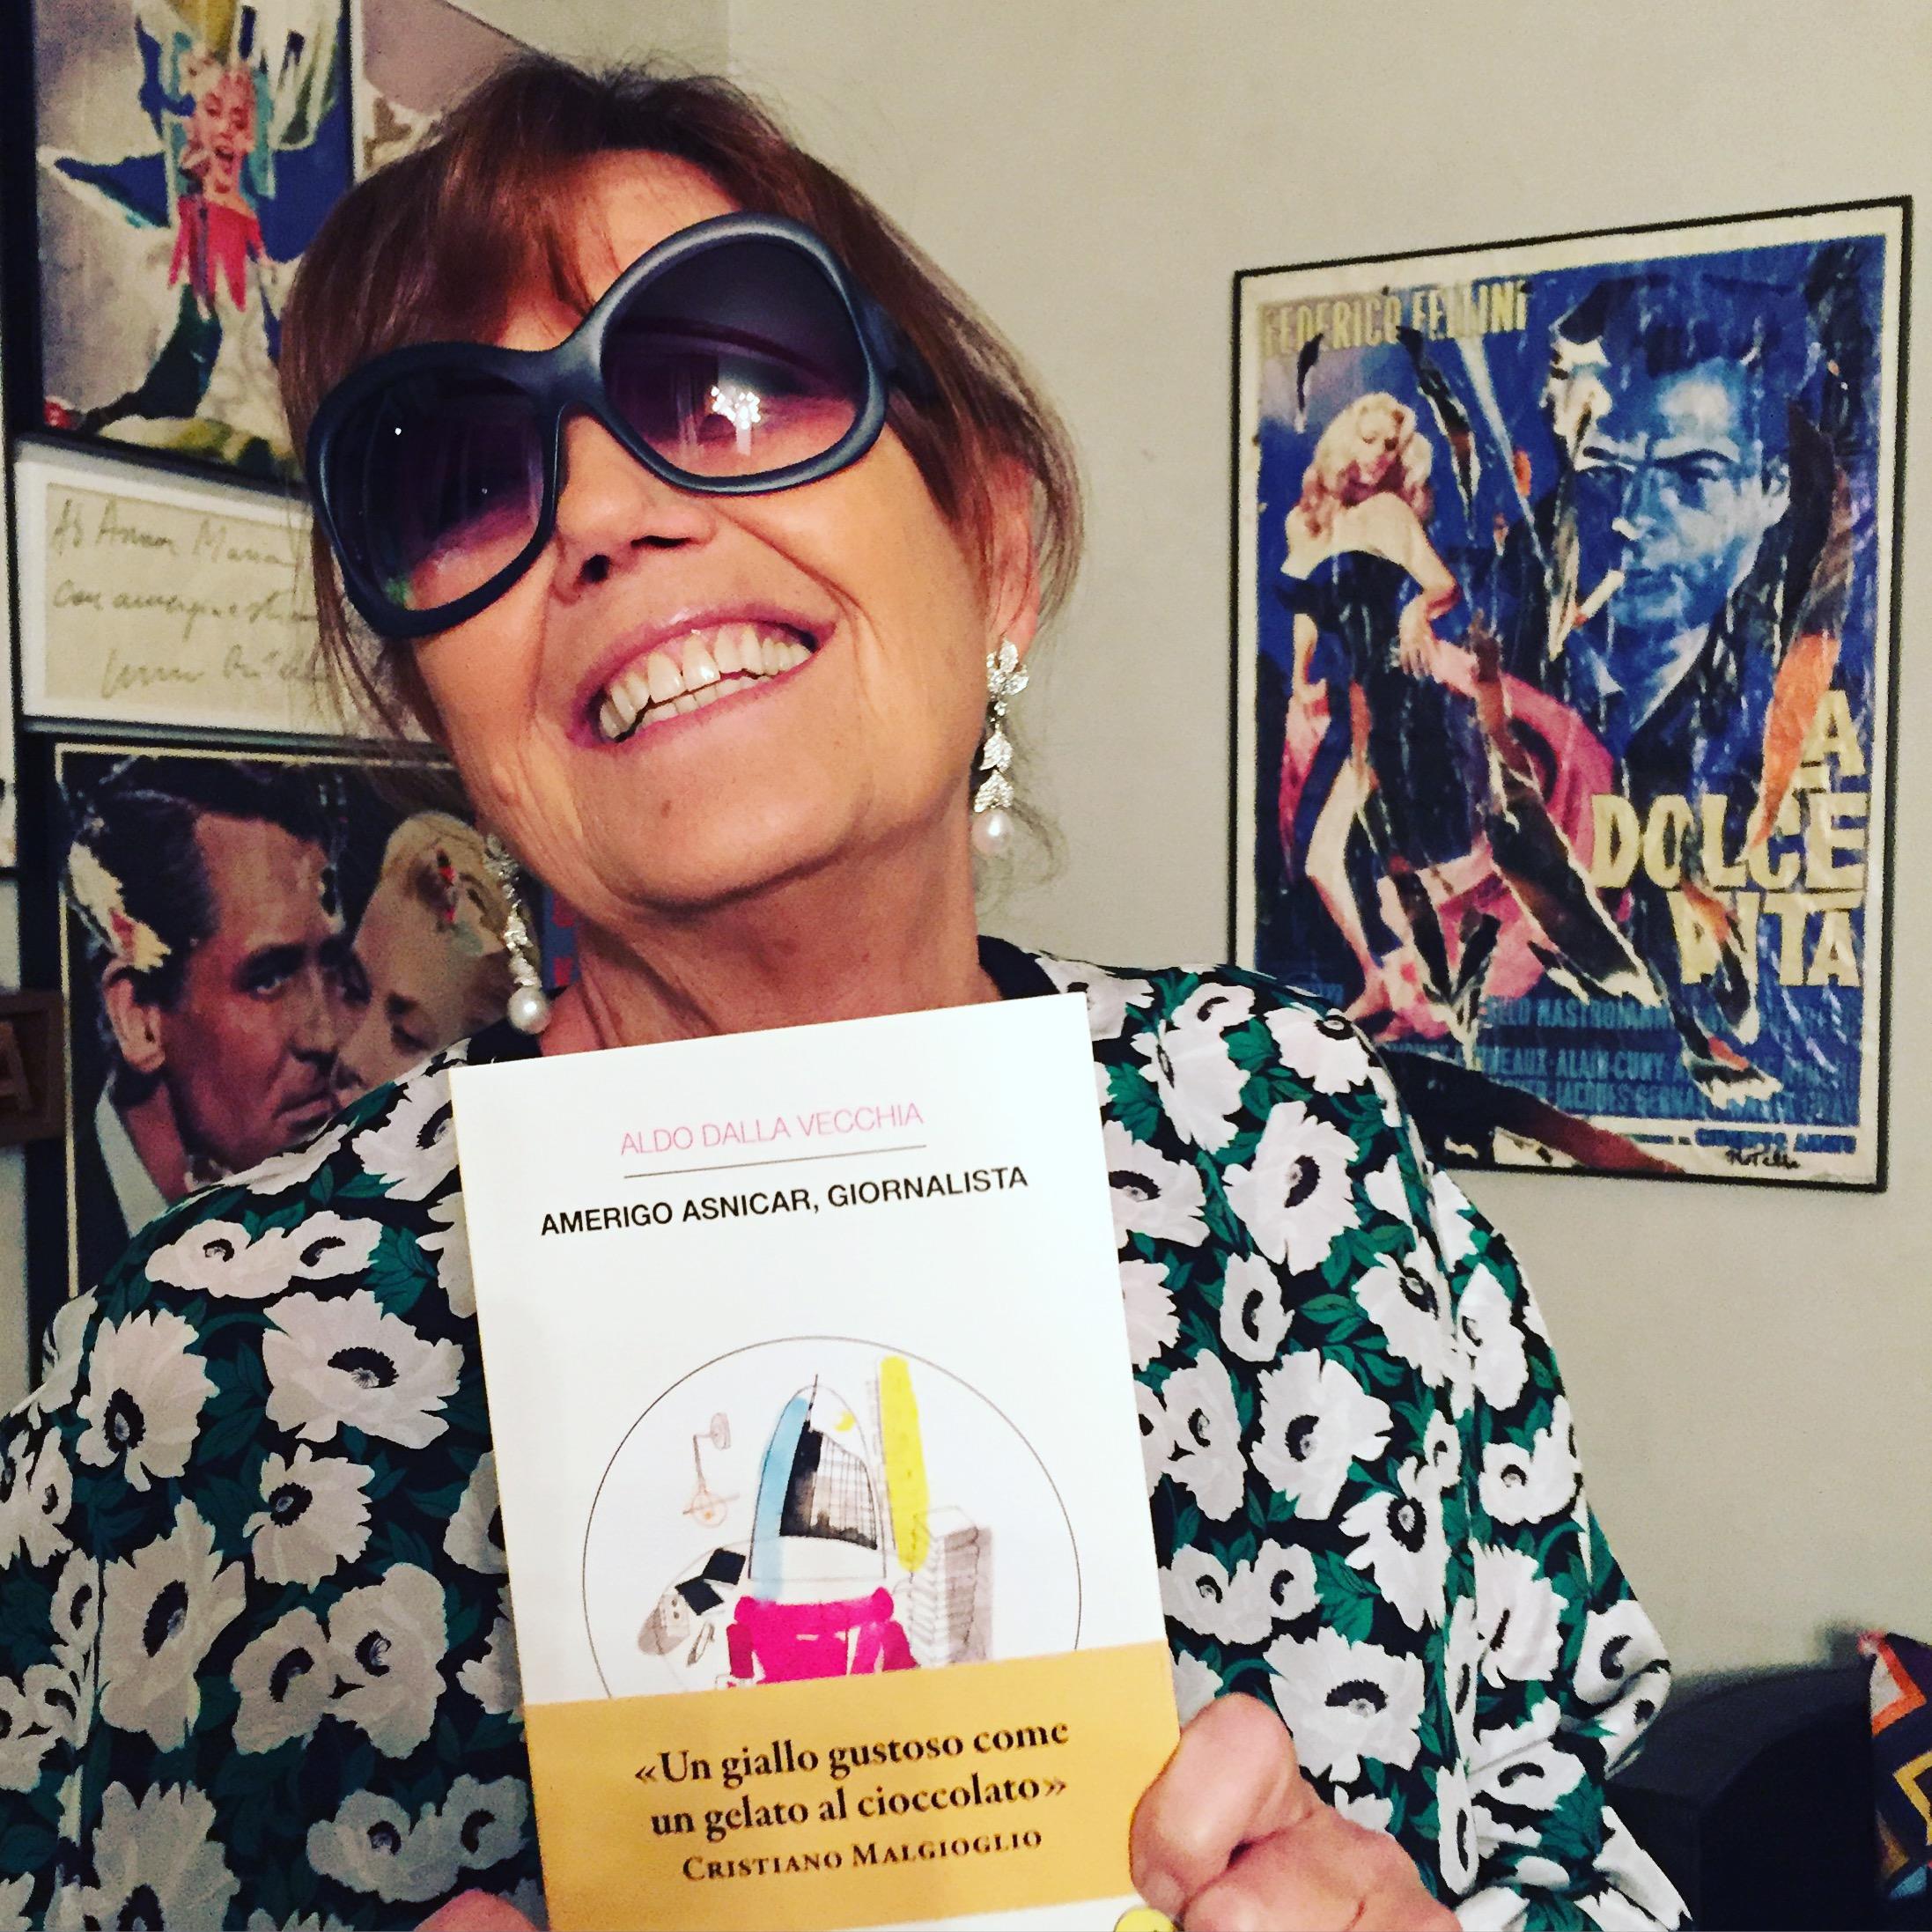 ANNAMARIA BERNARDINI DE PACE ♥ AMERIGO ASNICAR, GIORNALISTA (Milano, domenica 17 gennaio 2016).